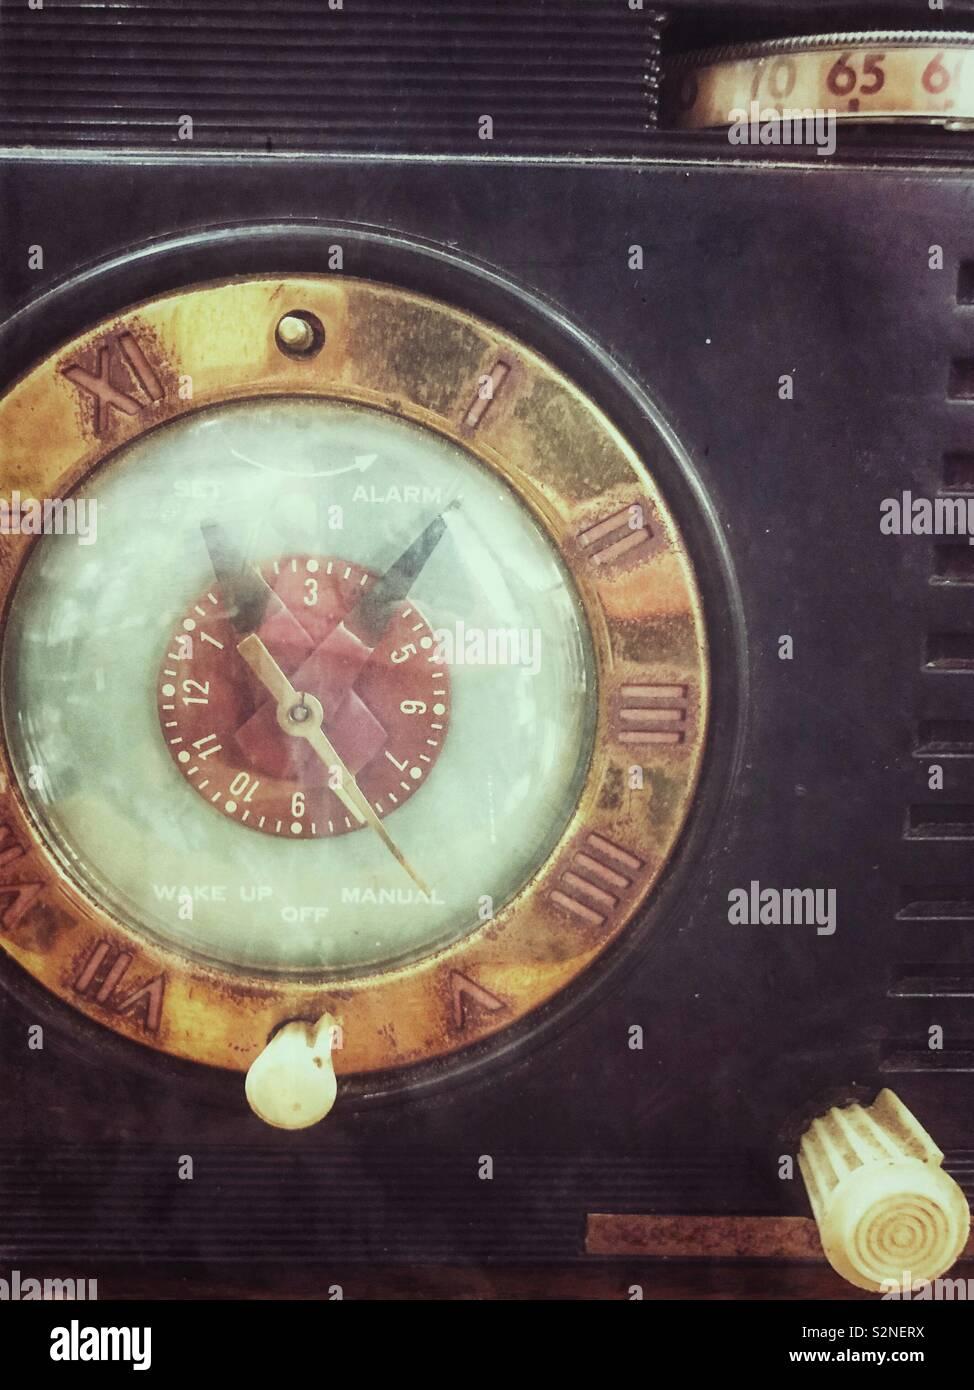 Retro styled clock radio - Stock Image